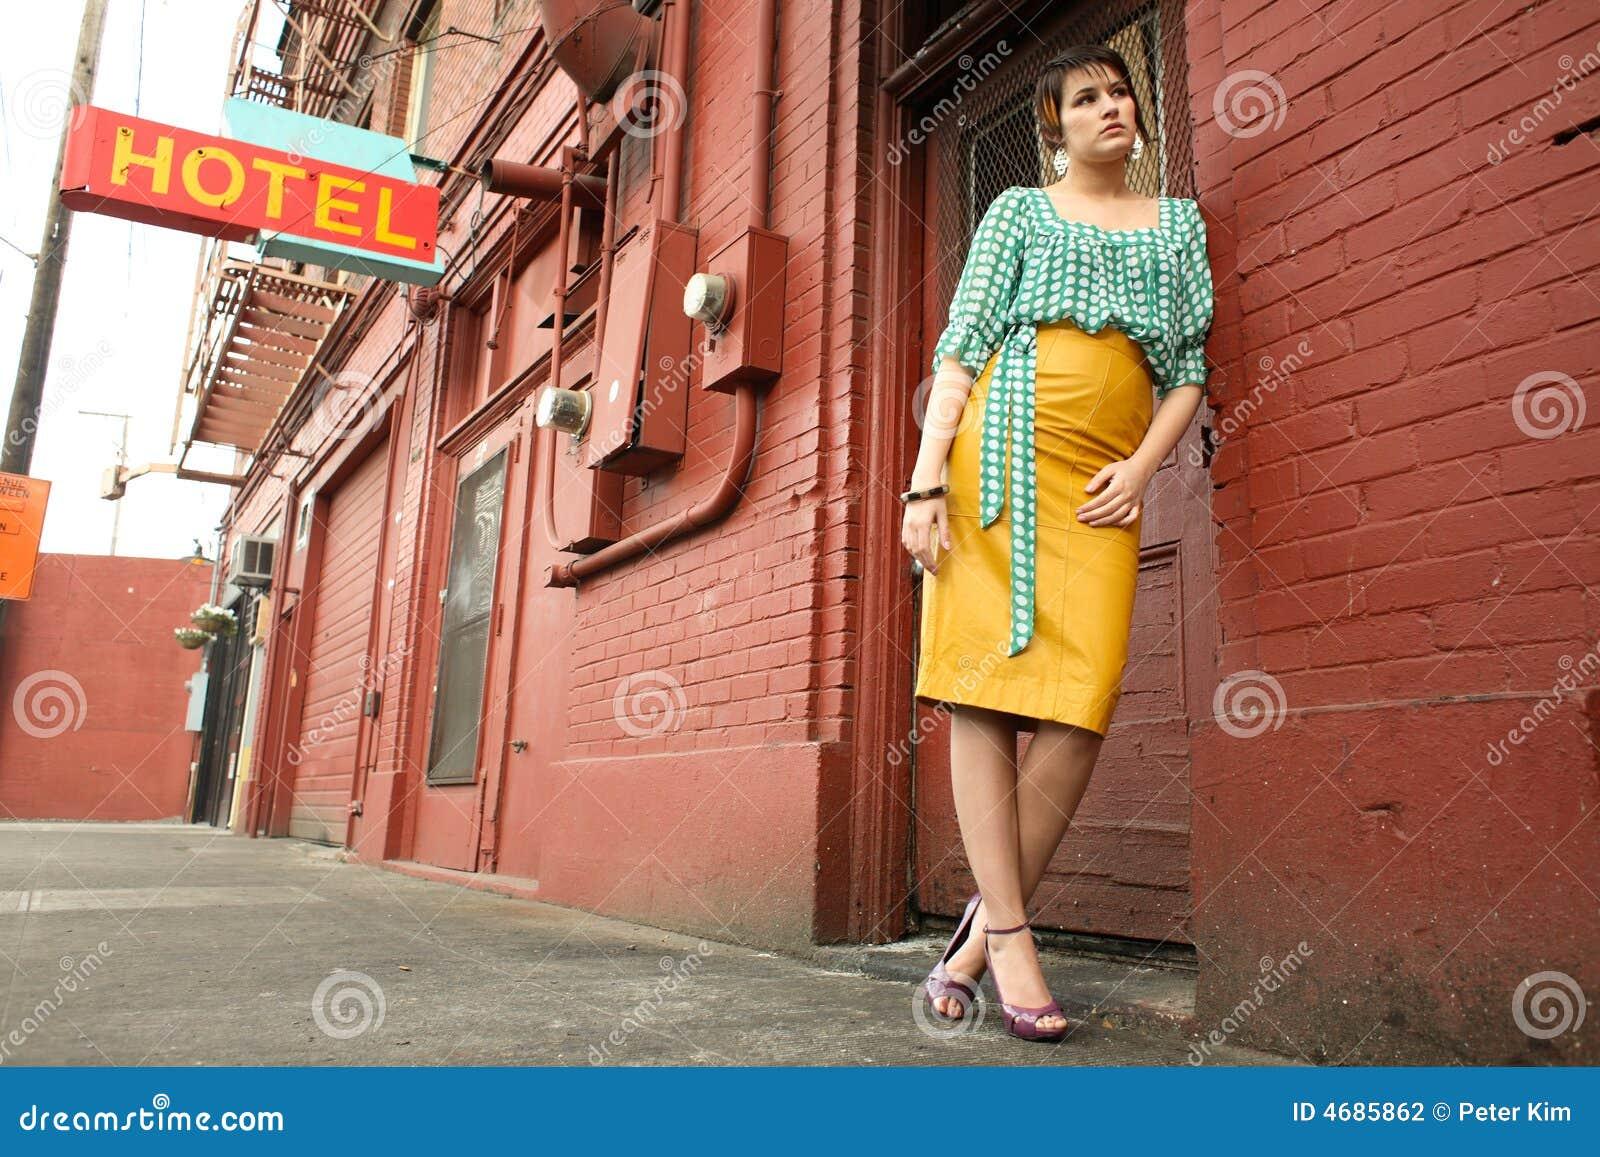 Young woman next to doorway